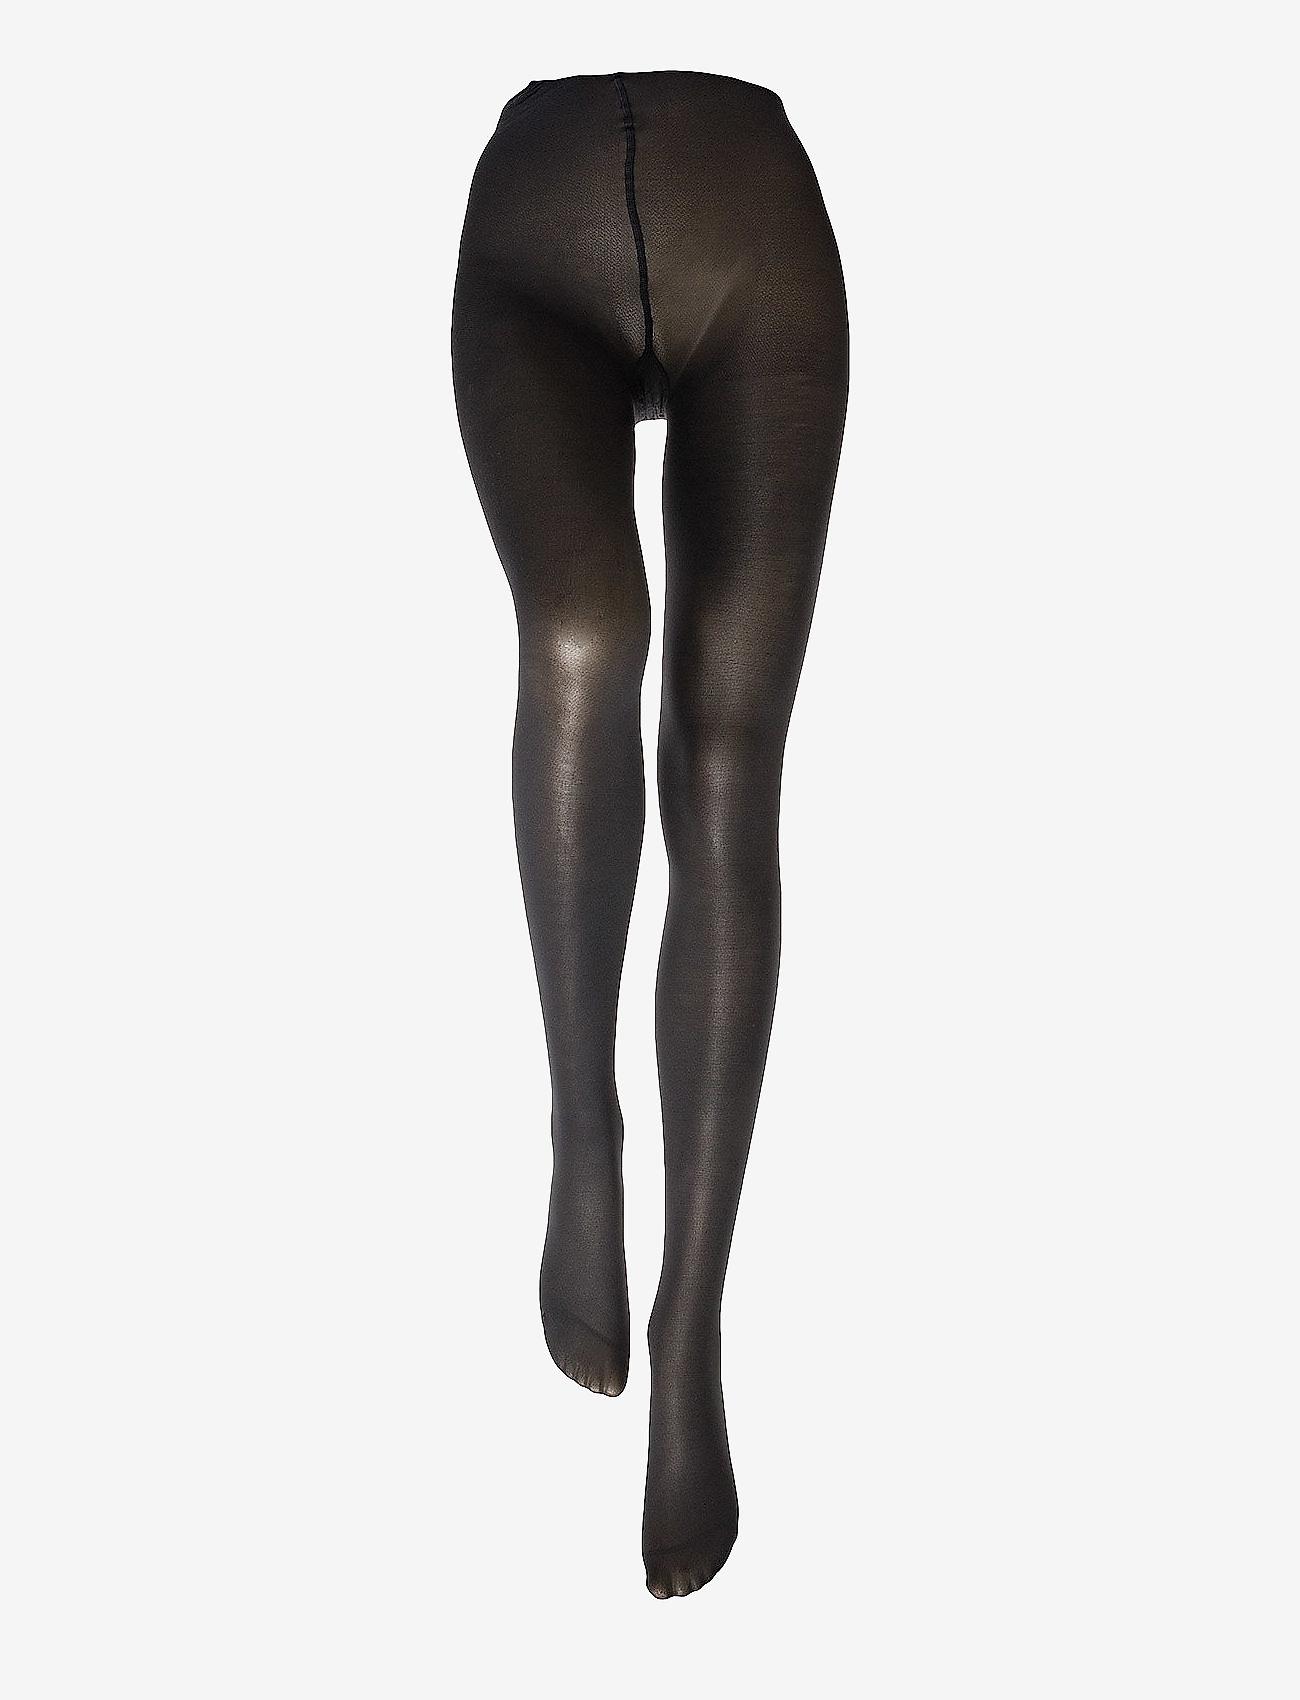 Vogue - Ladies den pantyhose, Opaque 40 den - basic pantyhose - carbon - 1